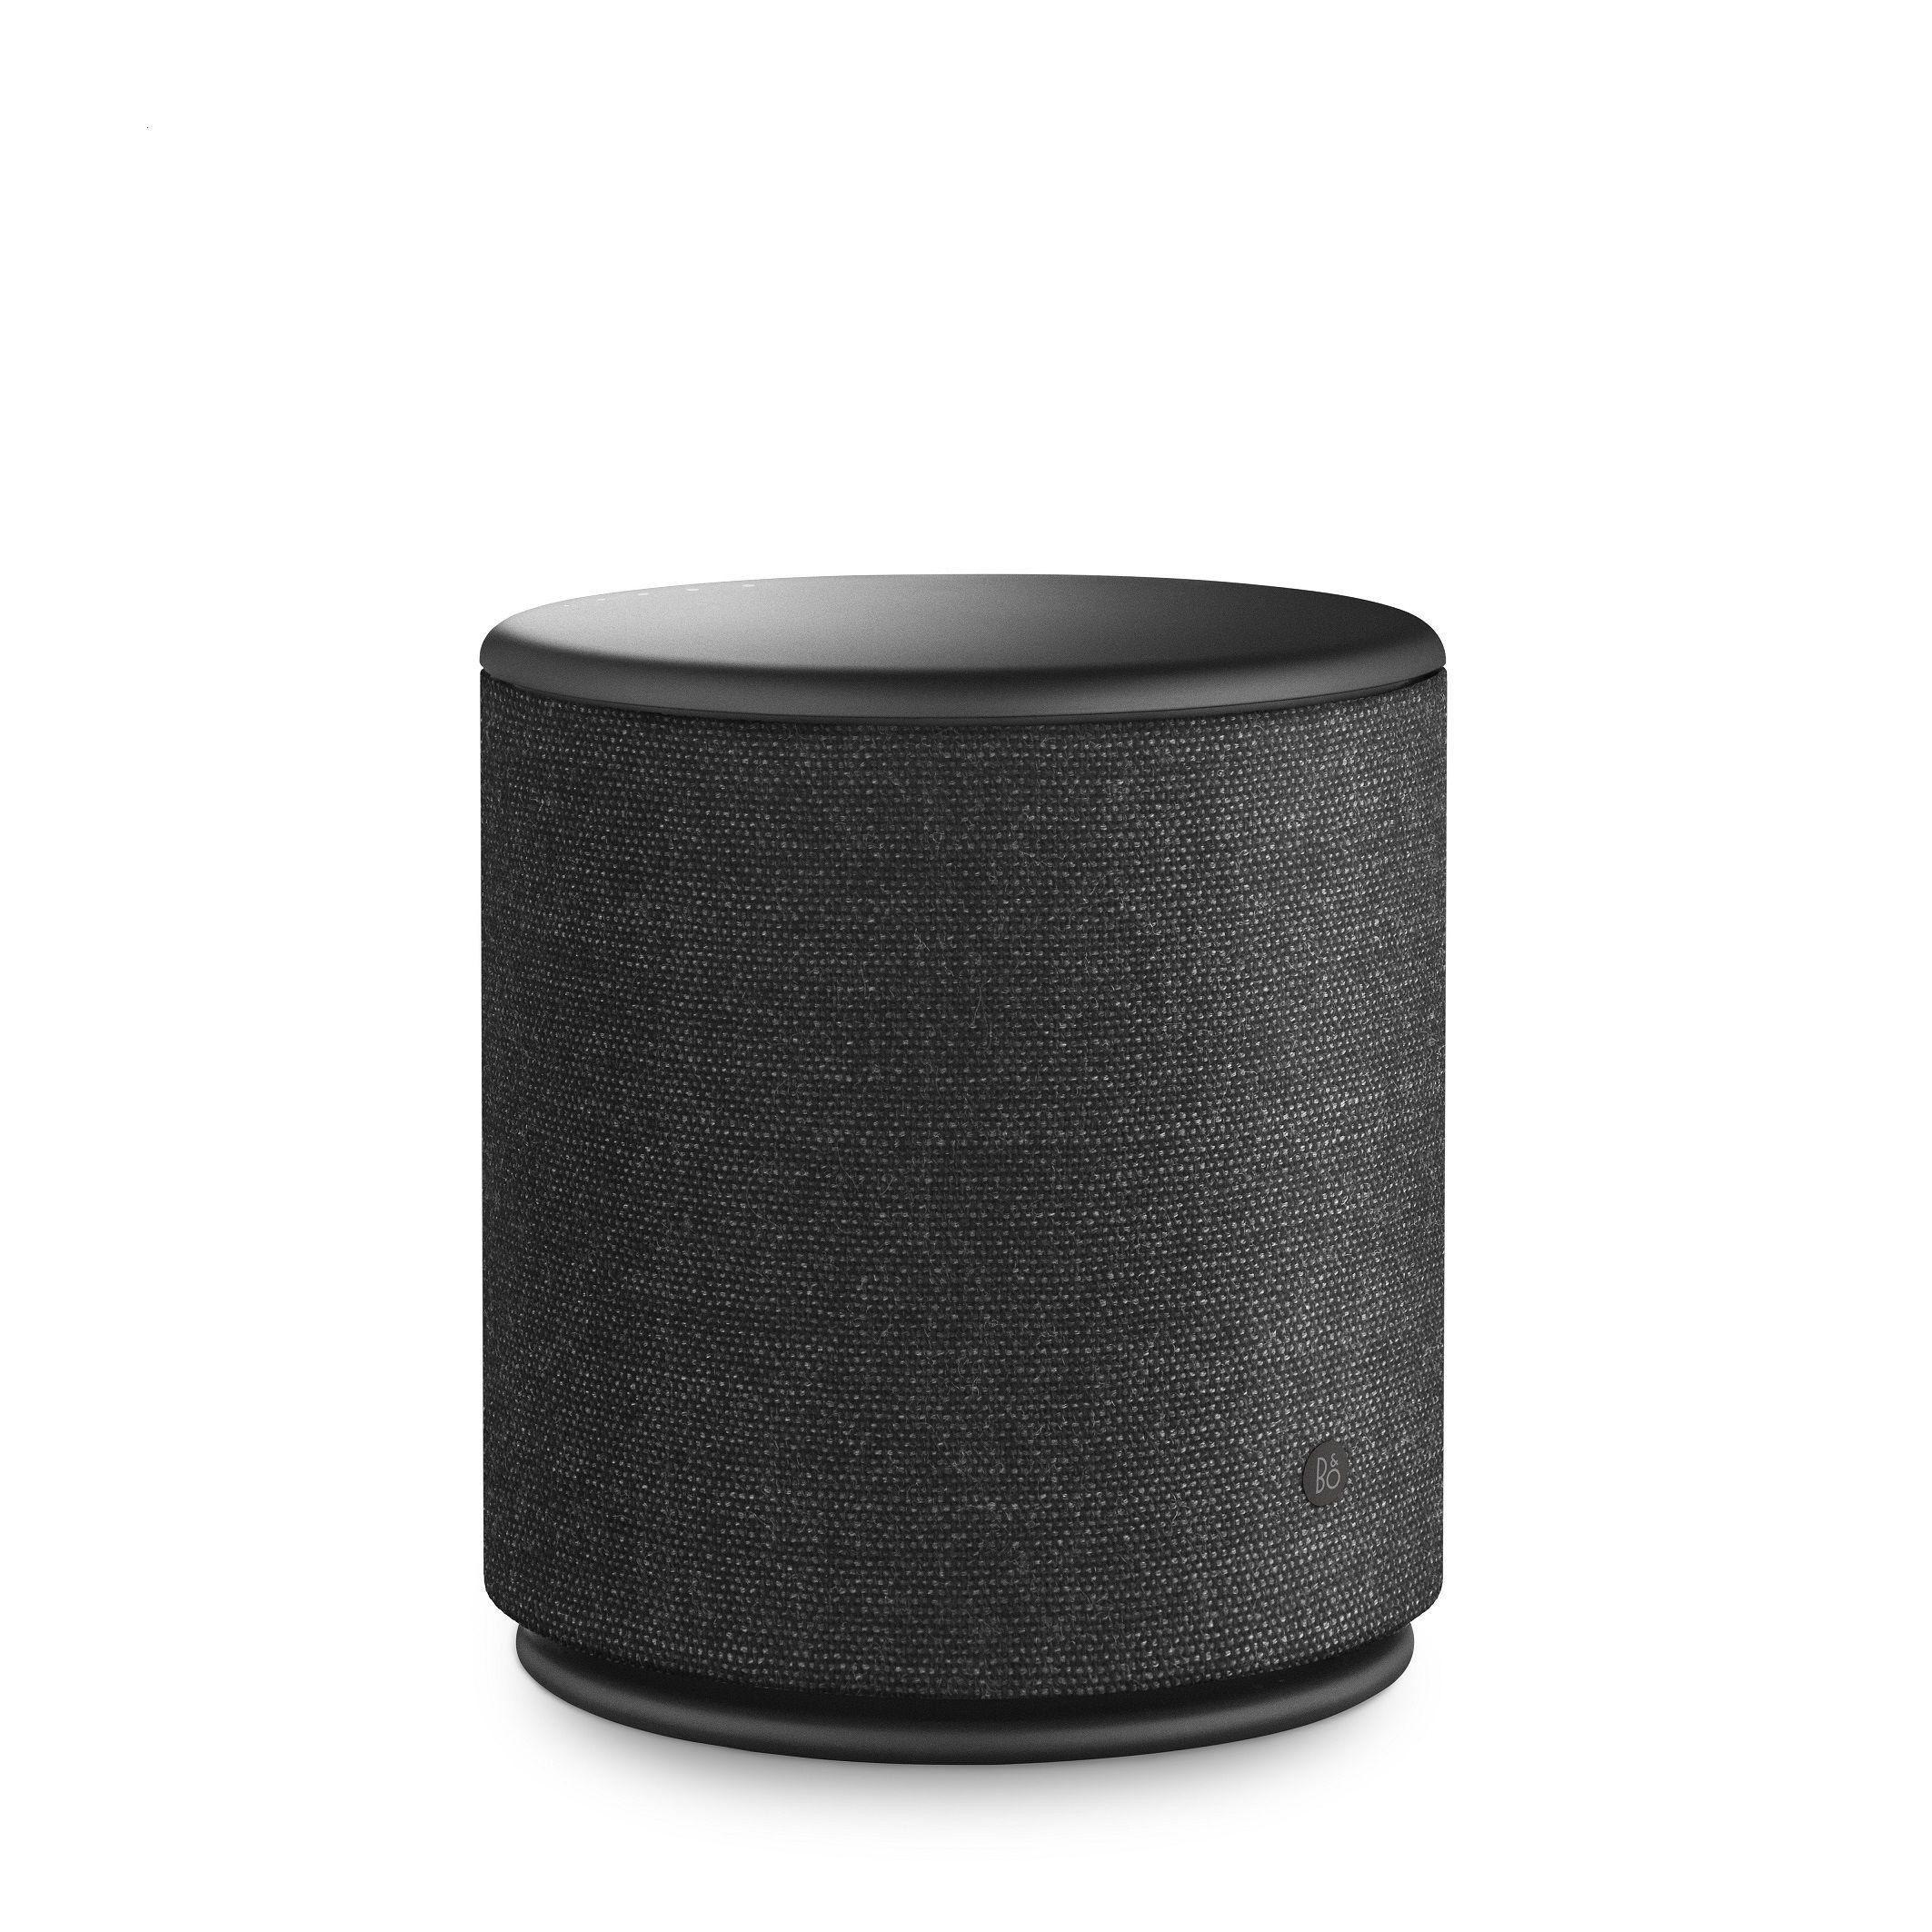 (5)Beoplay M5无线蓝牙音箱 - 黑色.jpg